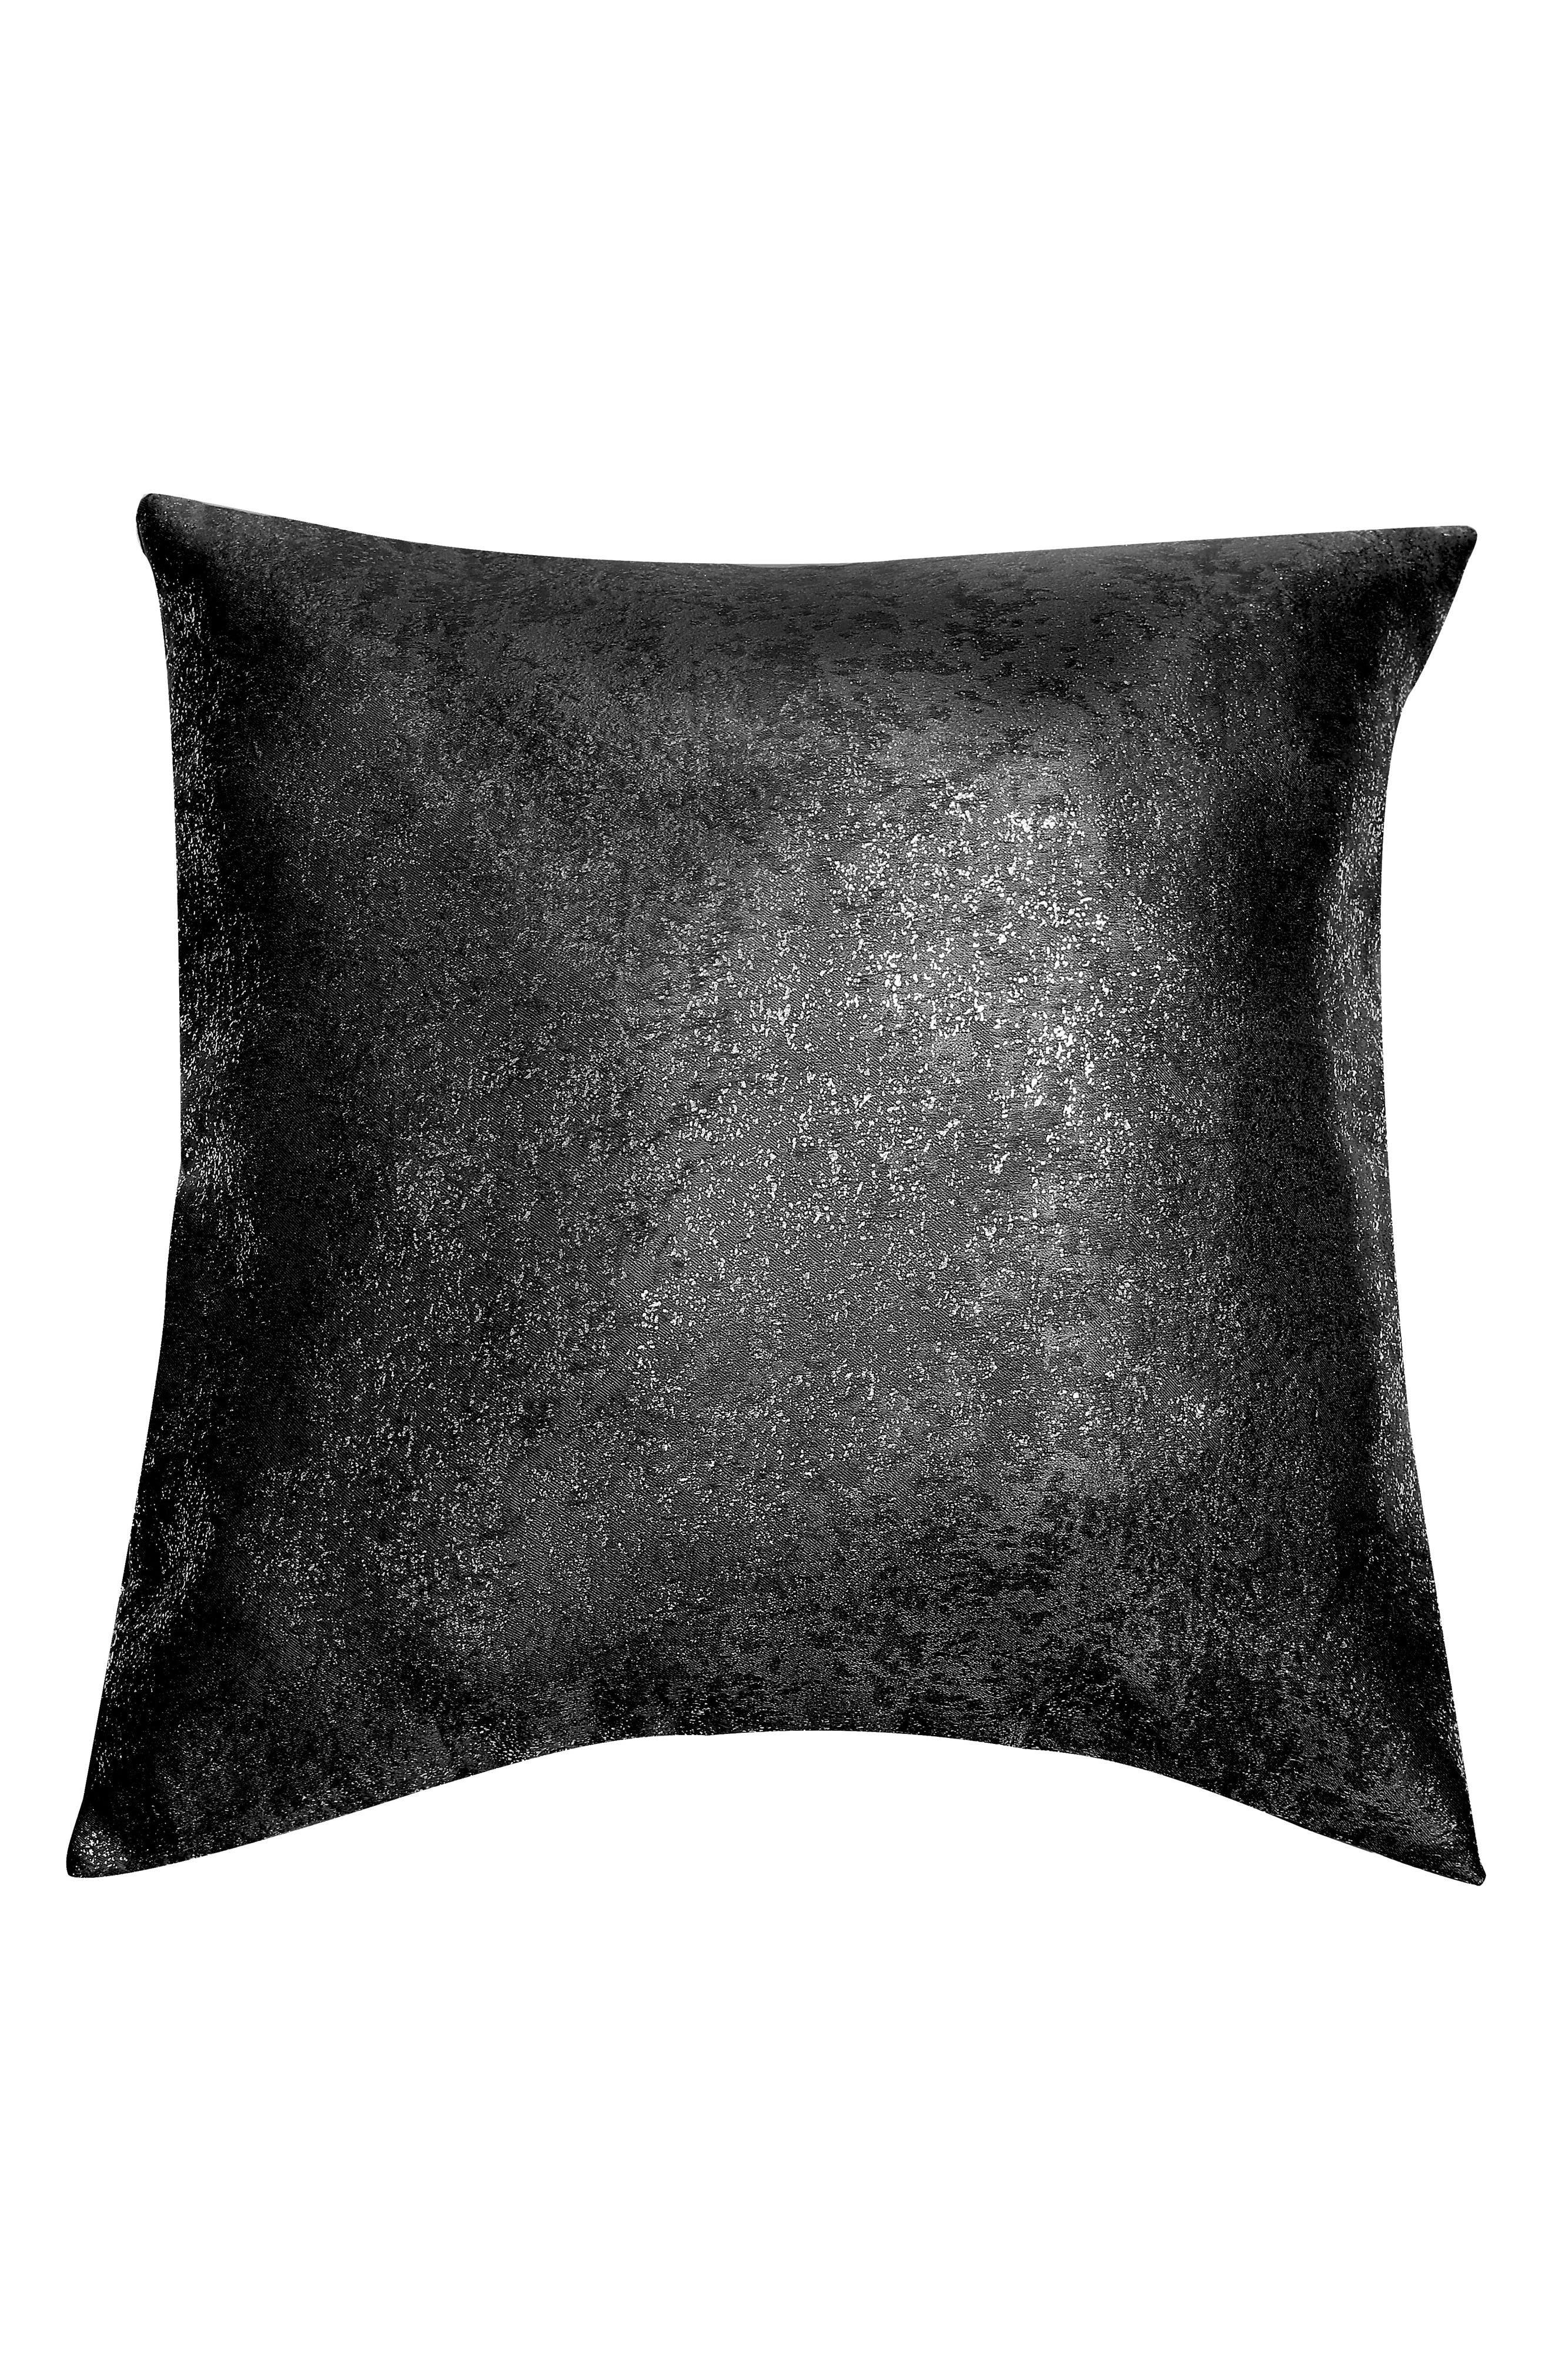 Maddie Accent Pillow,                             Main thumbnail 1, color,                             Black